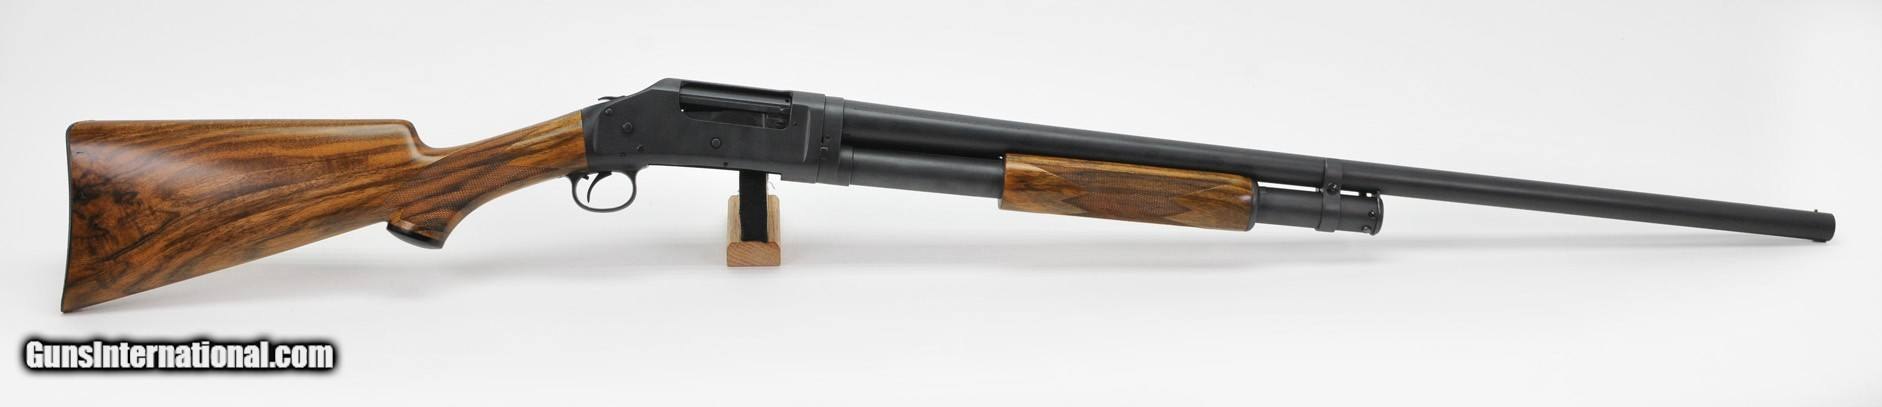 winchester model 97 shotgun manual